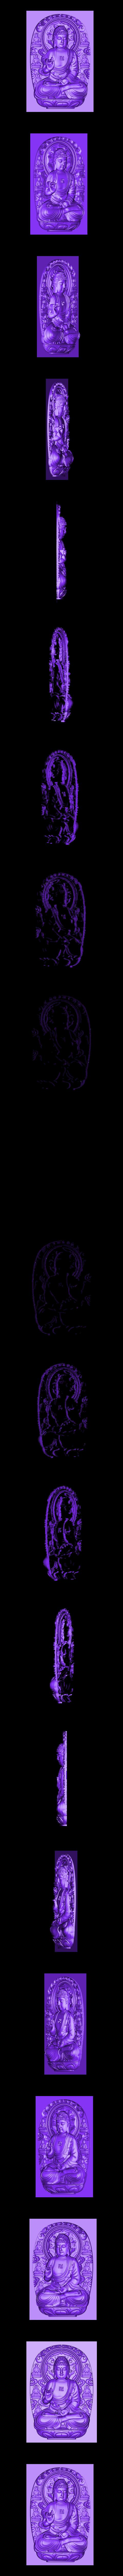 buddhaUUU.obj Download free OBJ file buddha • 3D printer object, stlfilesfree